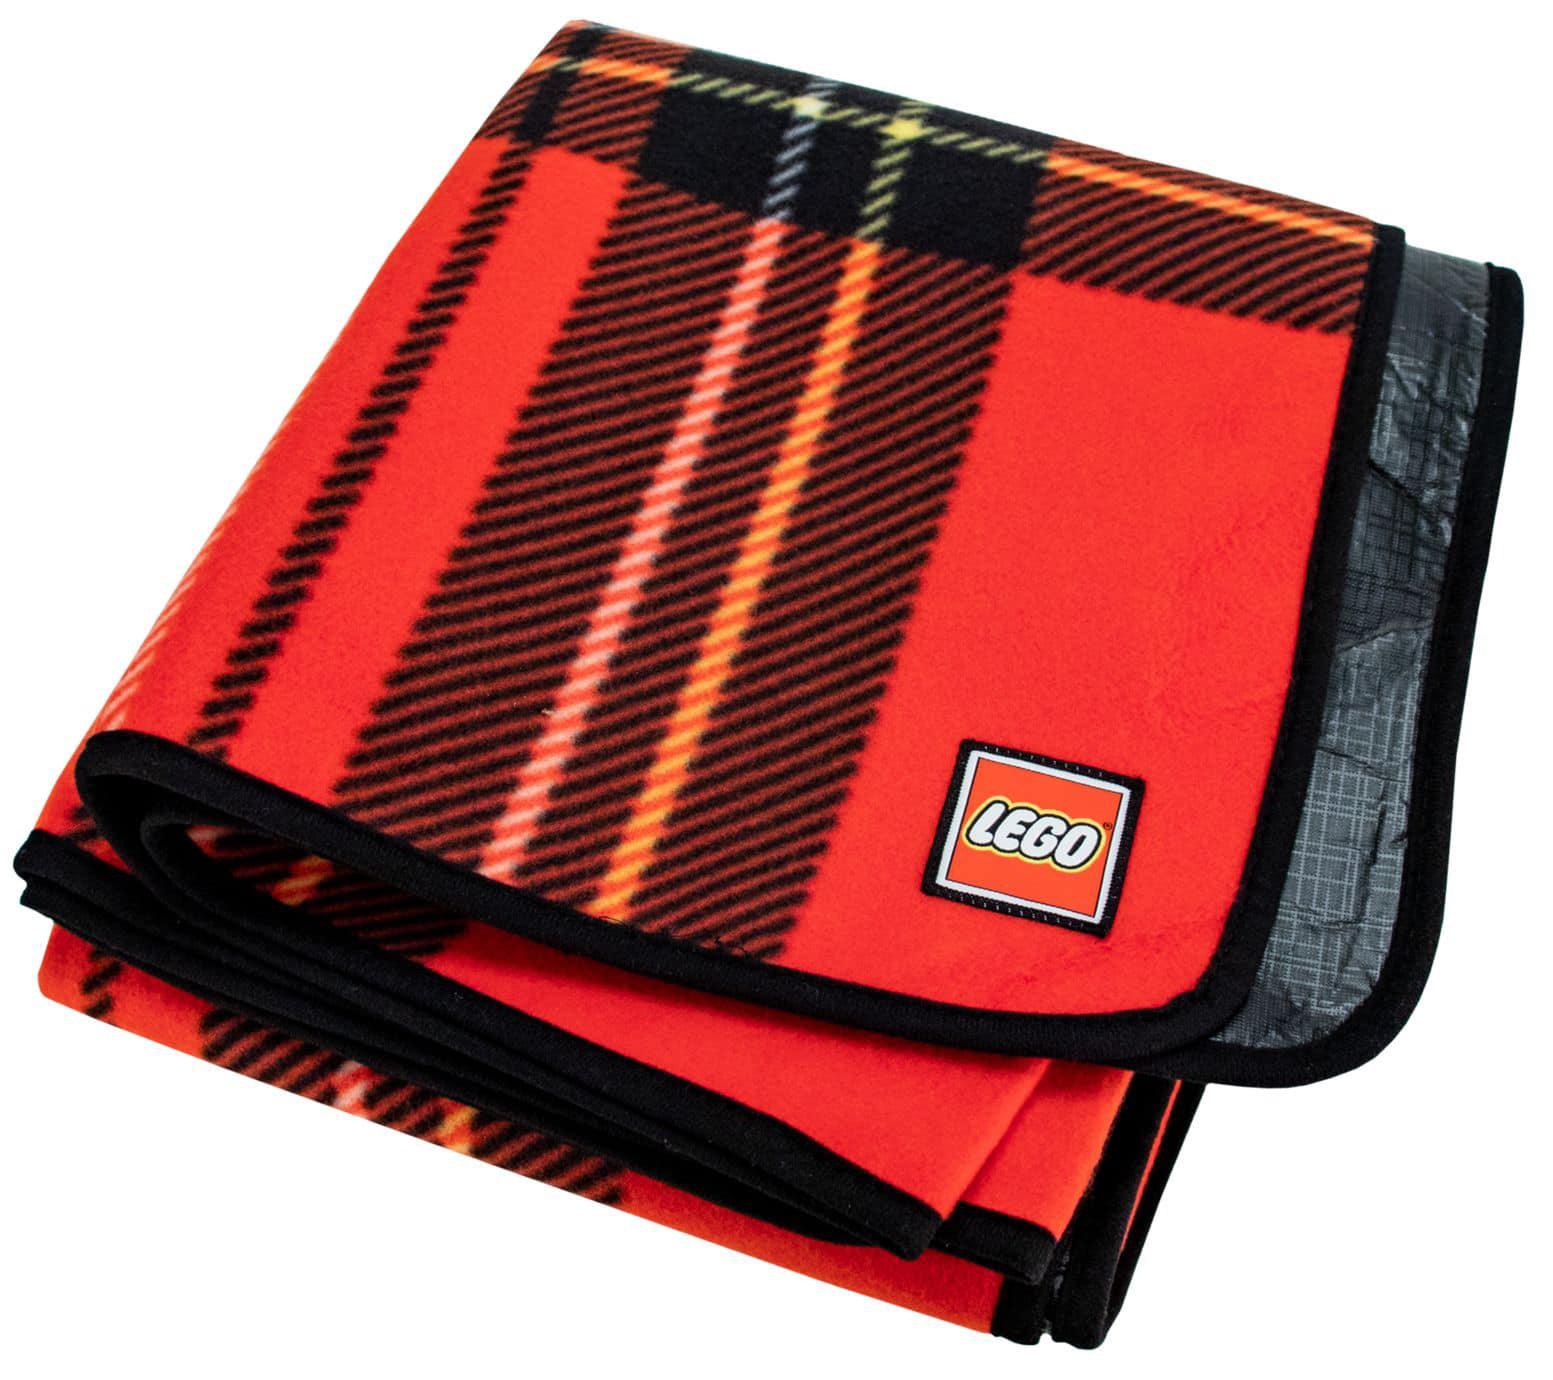 LEGO 5006016 Picknickdecke Gratis